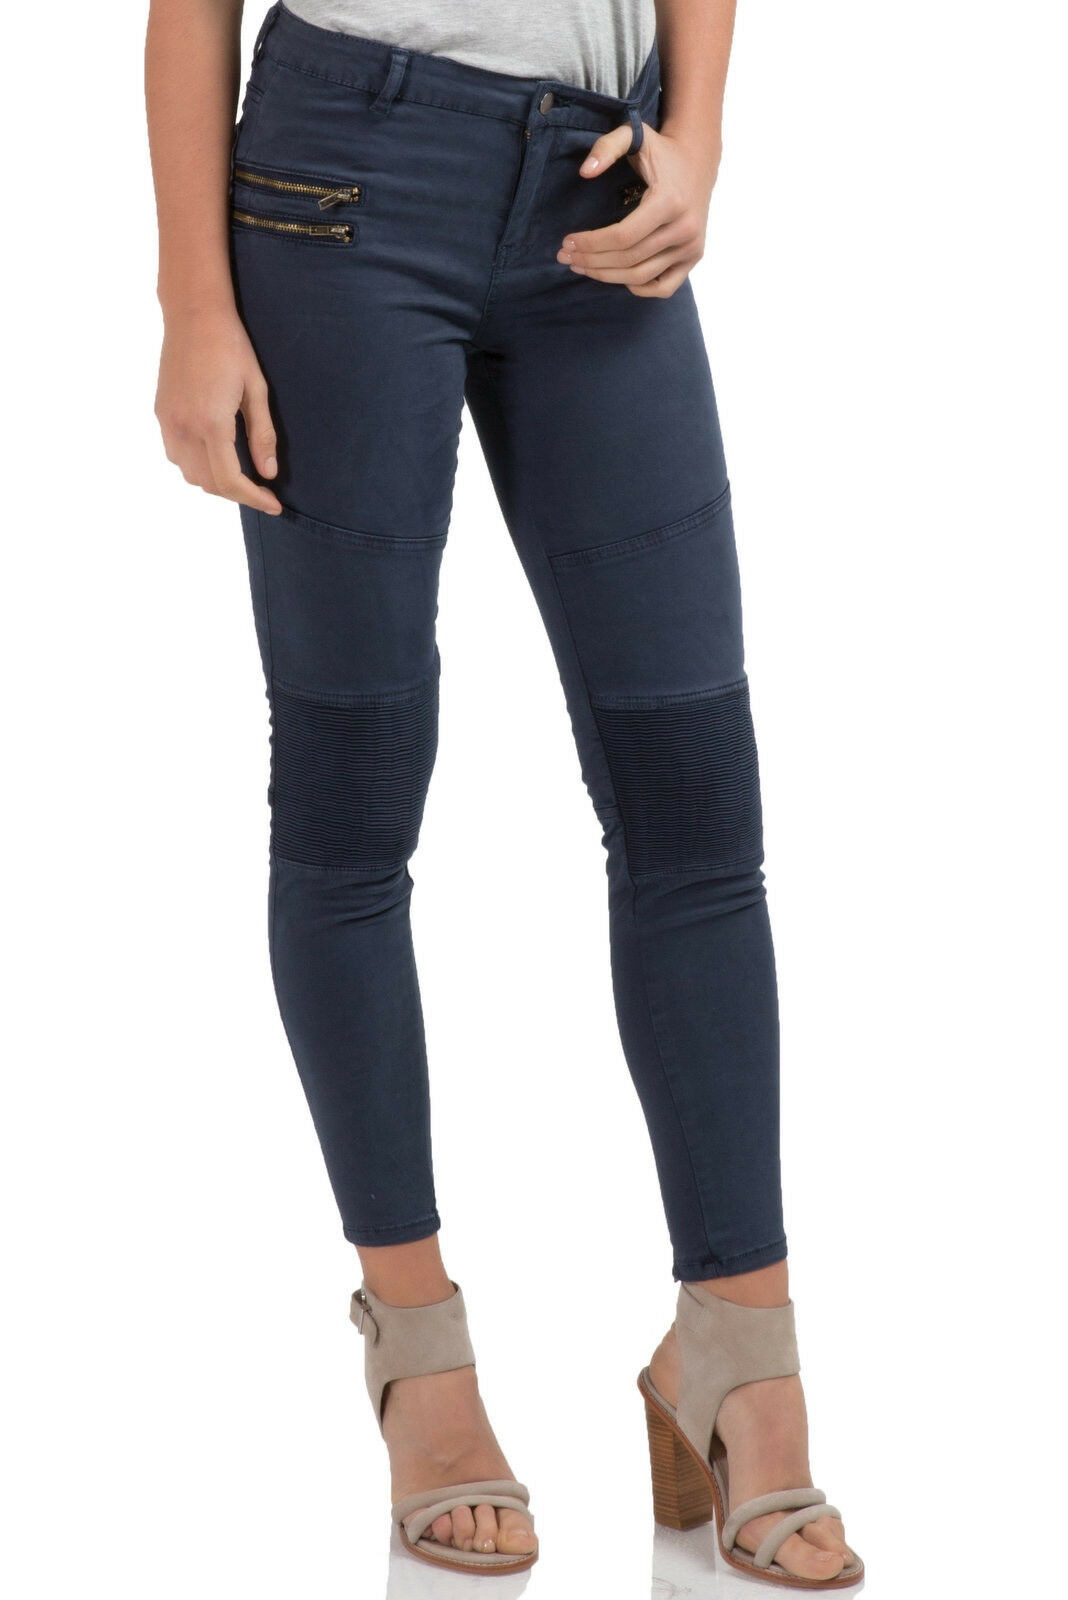 Elan pants w knee pleats in navy color